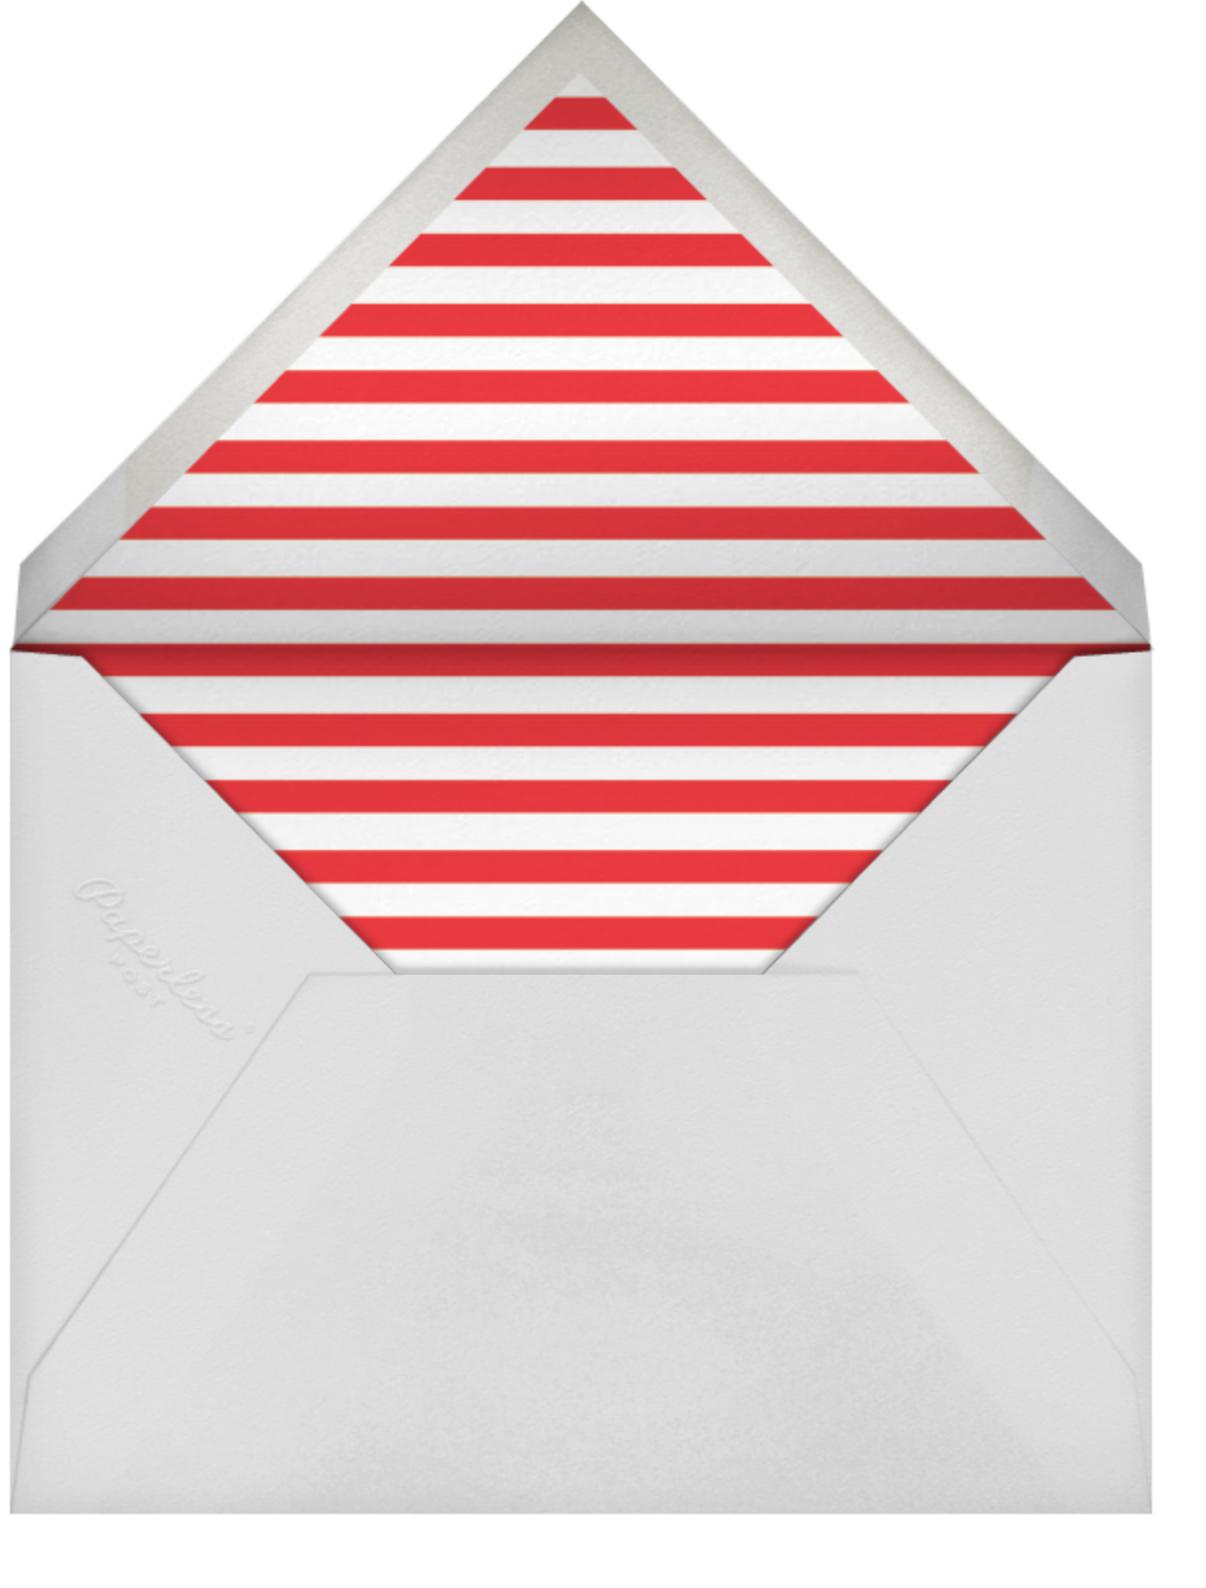 Gingerbread Invite - Blood Orange - The Indigo Bunting - Christmas party - envelope back